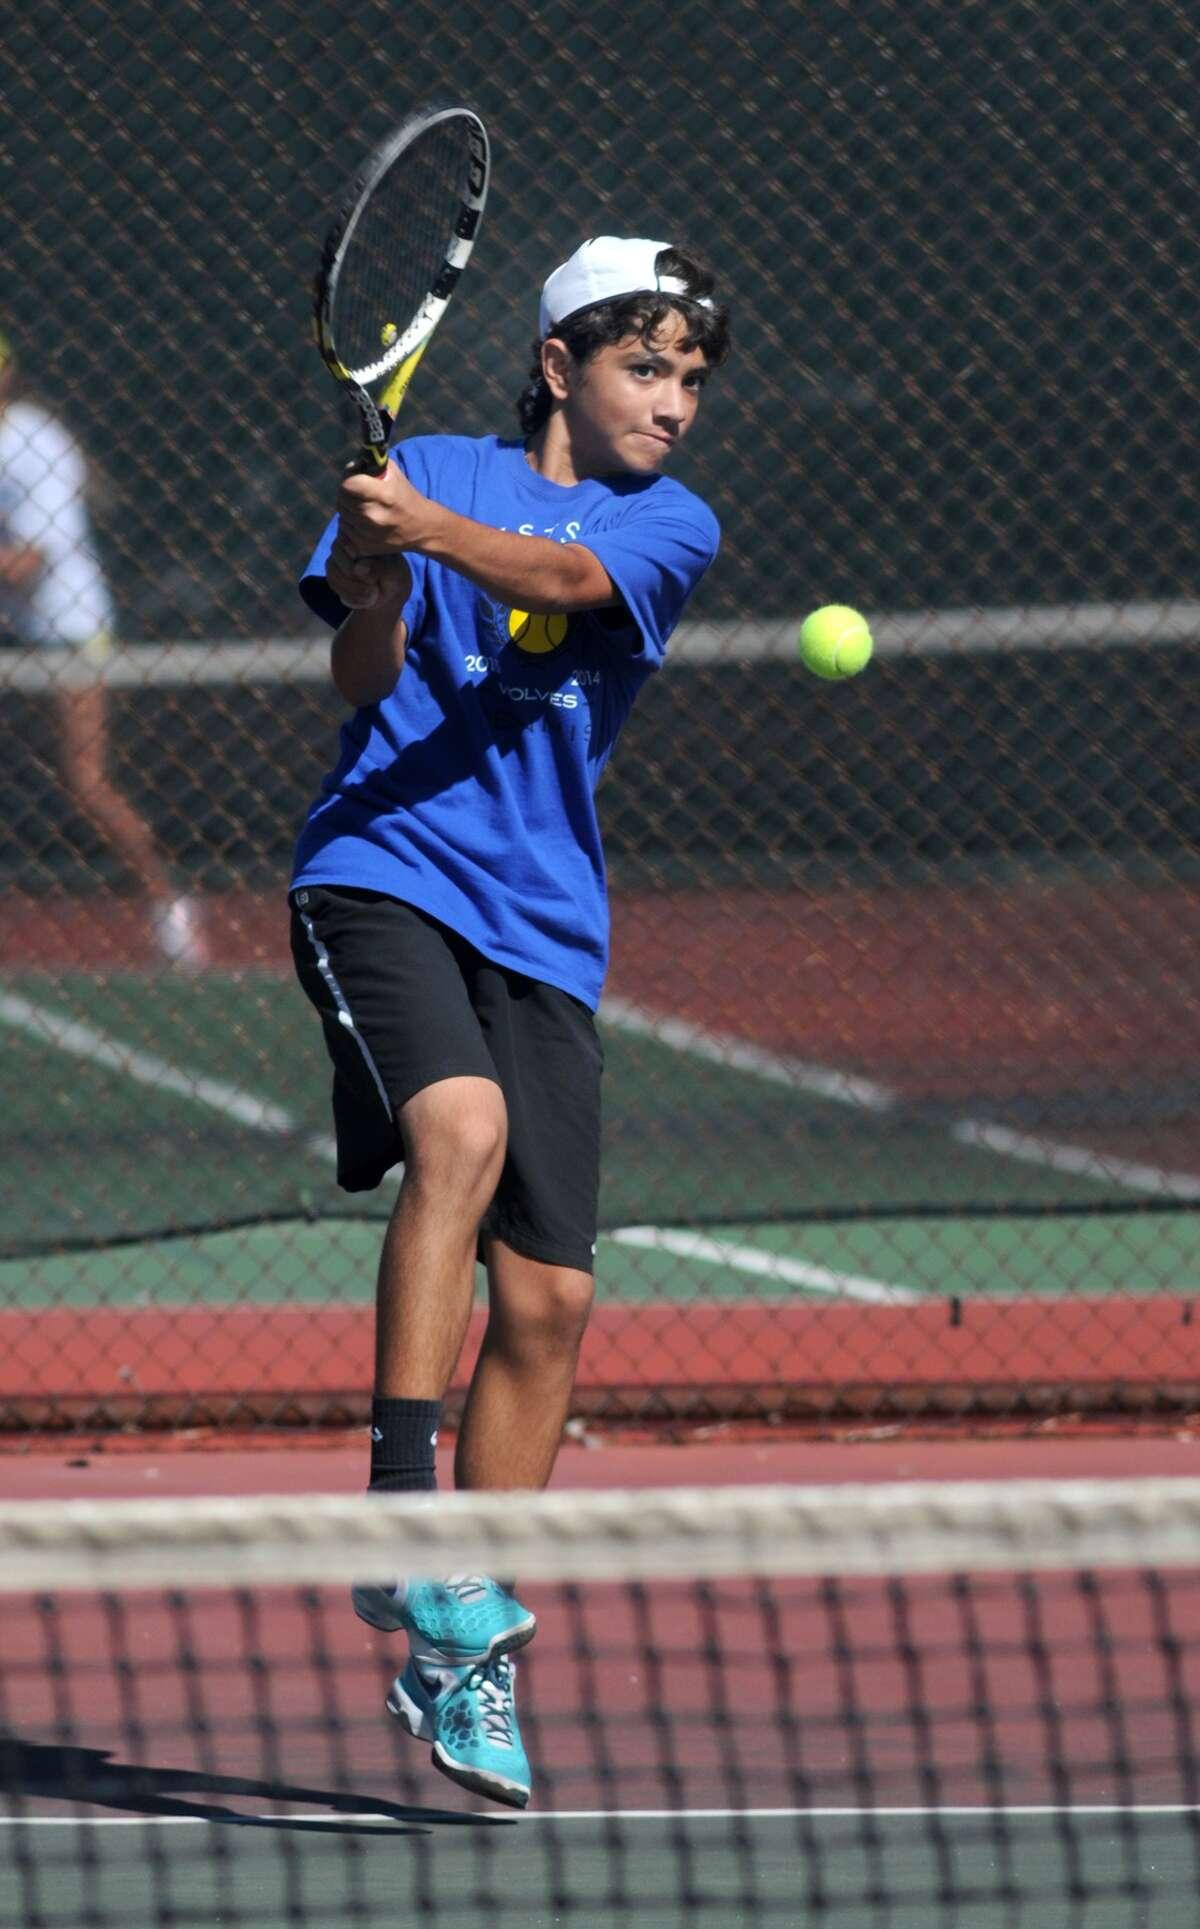 Daniel Mehralizadeh works during a singles match at Memorial Park.